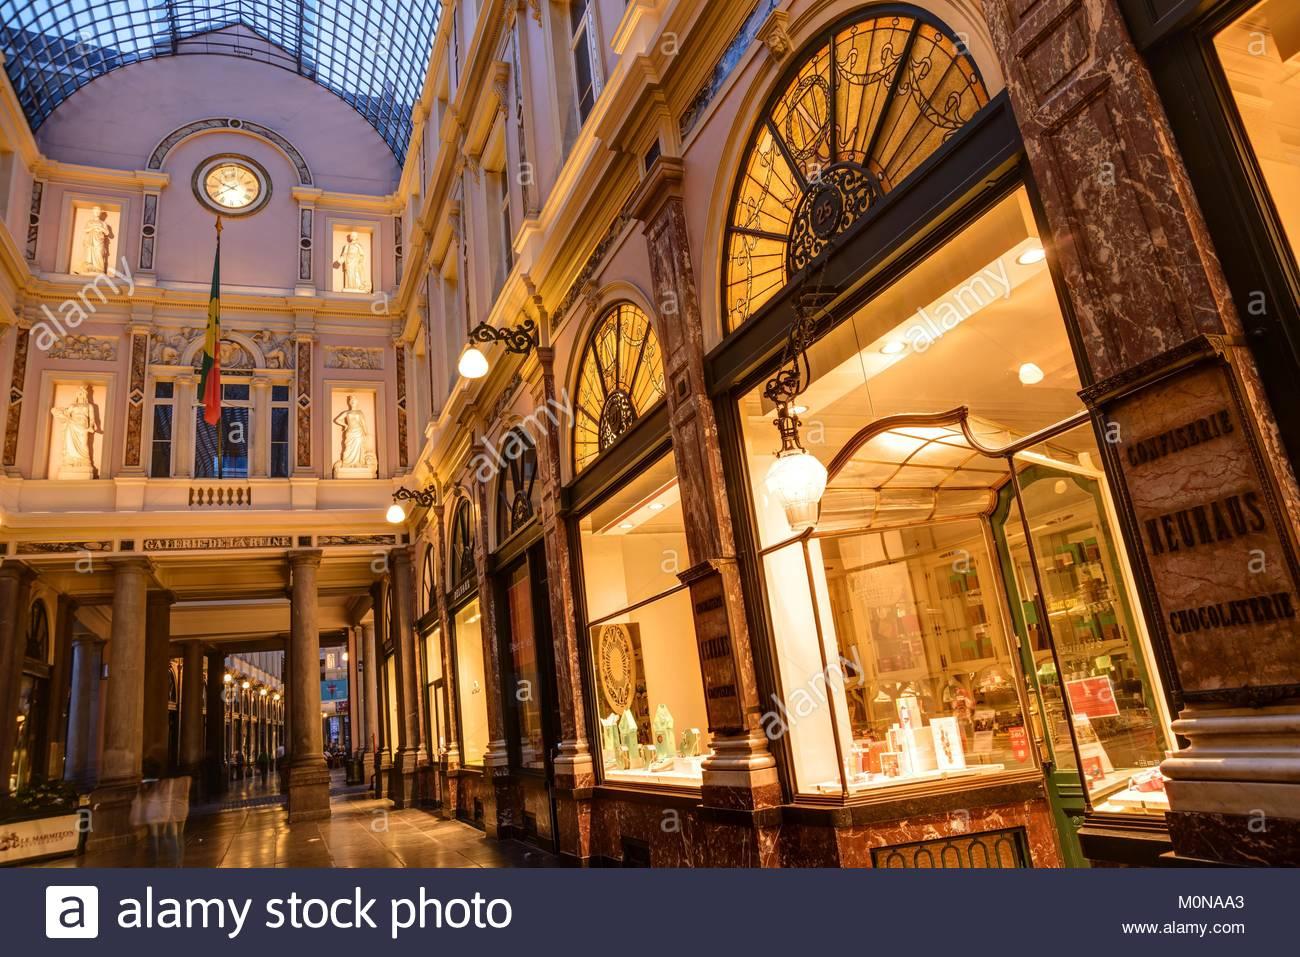 Brüssel, Les Galeries Royales Saint-Hubert, Koninklijke Sint-Hubertusgalerijen, Confiserie und Chocolaterie - Stock Image